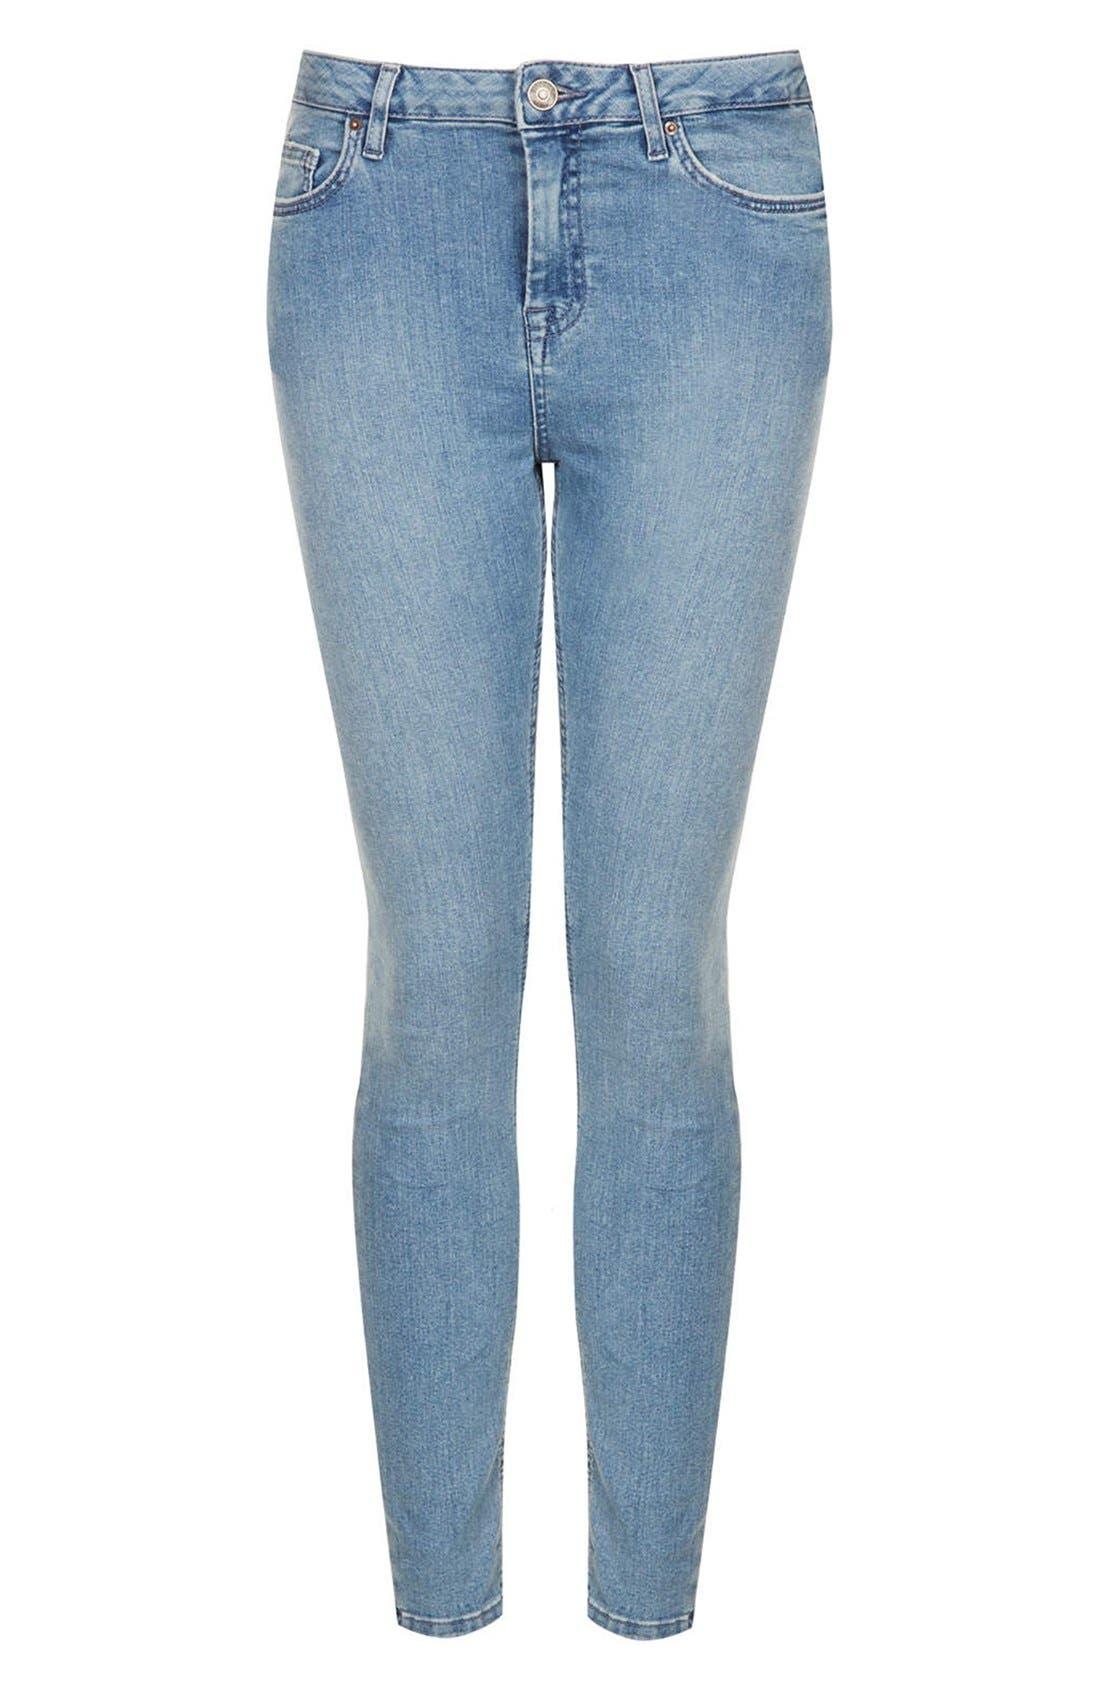 Alternate Image 3  - Topshop Moto 'Jamie' High Rise Skinny Jeans (Mid Stone)